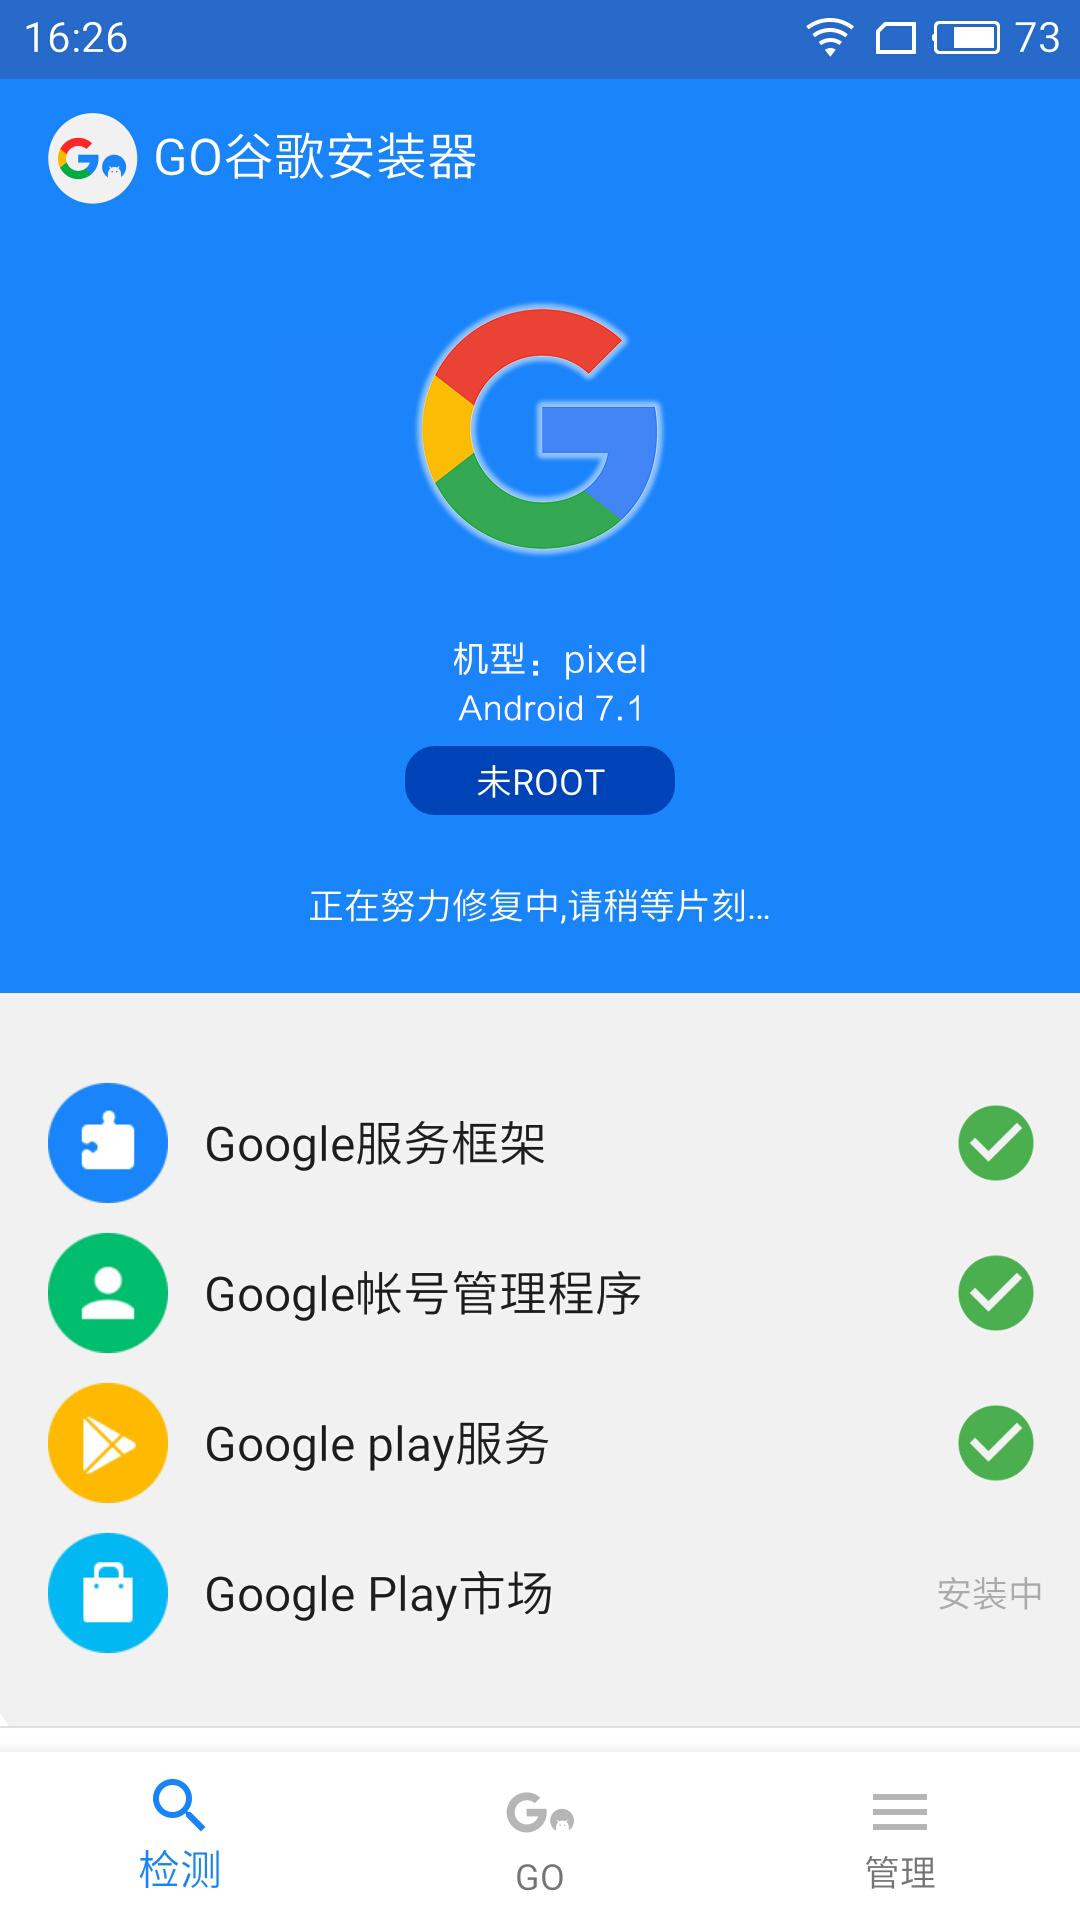 GO谷歌安装器-应用截图